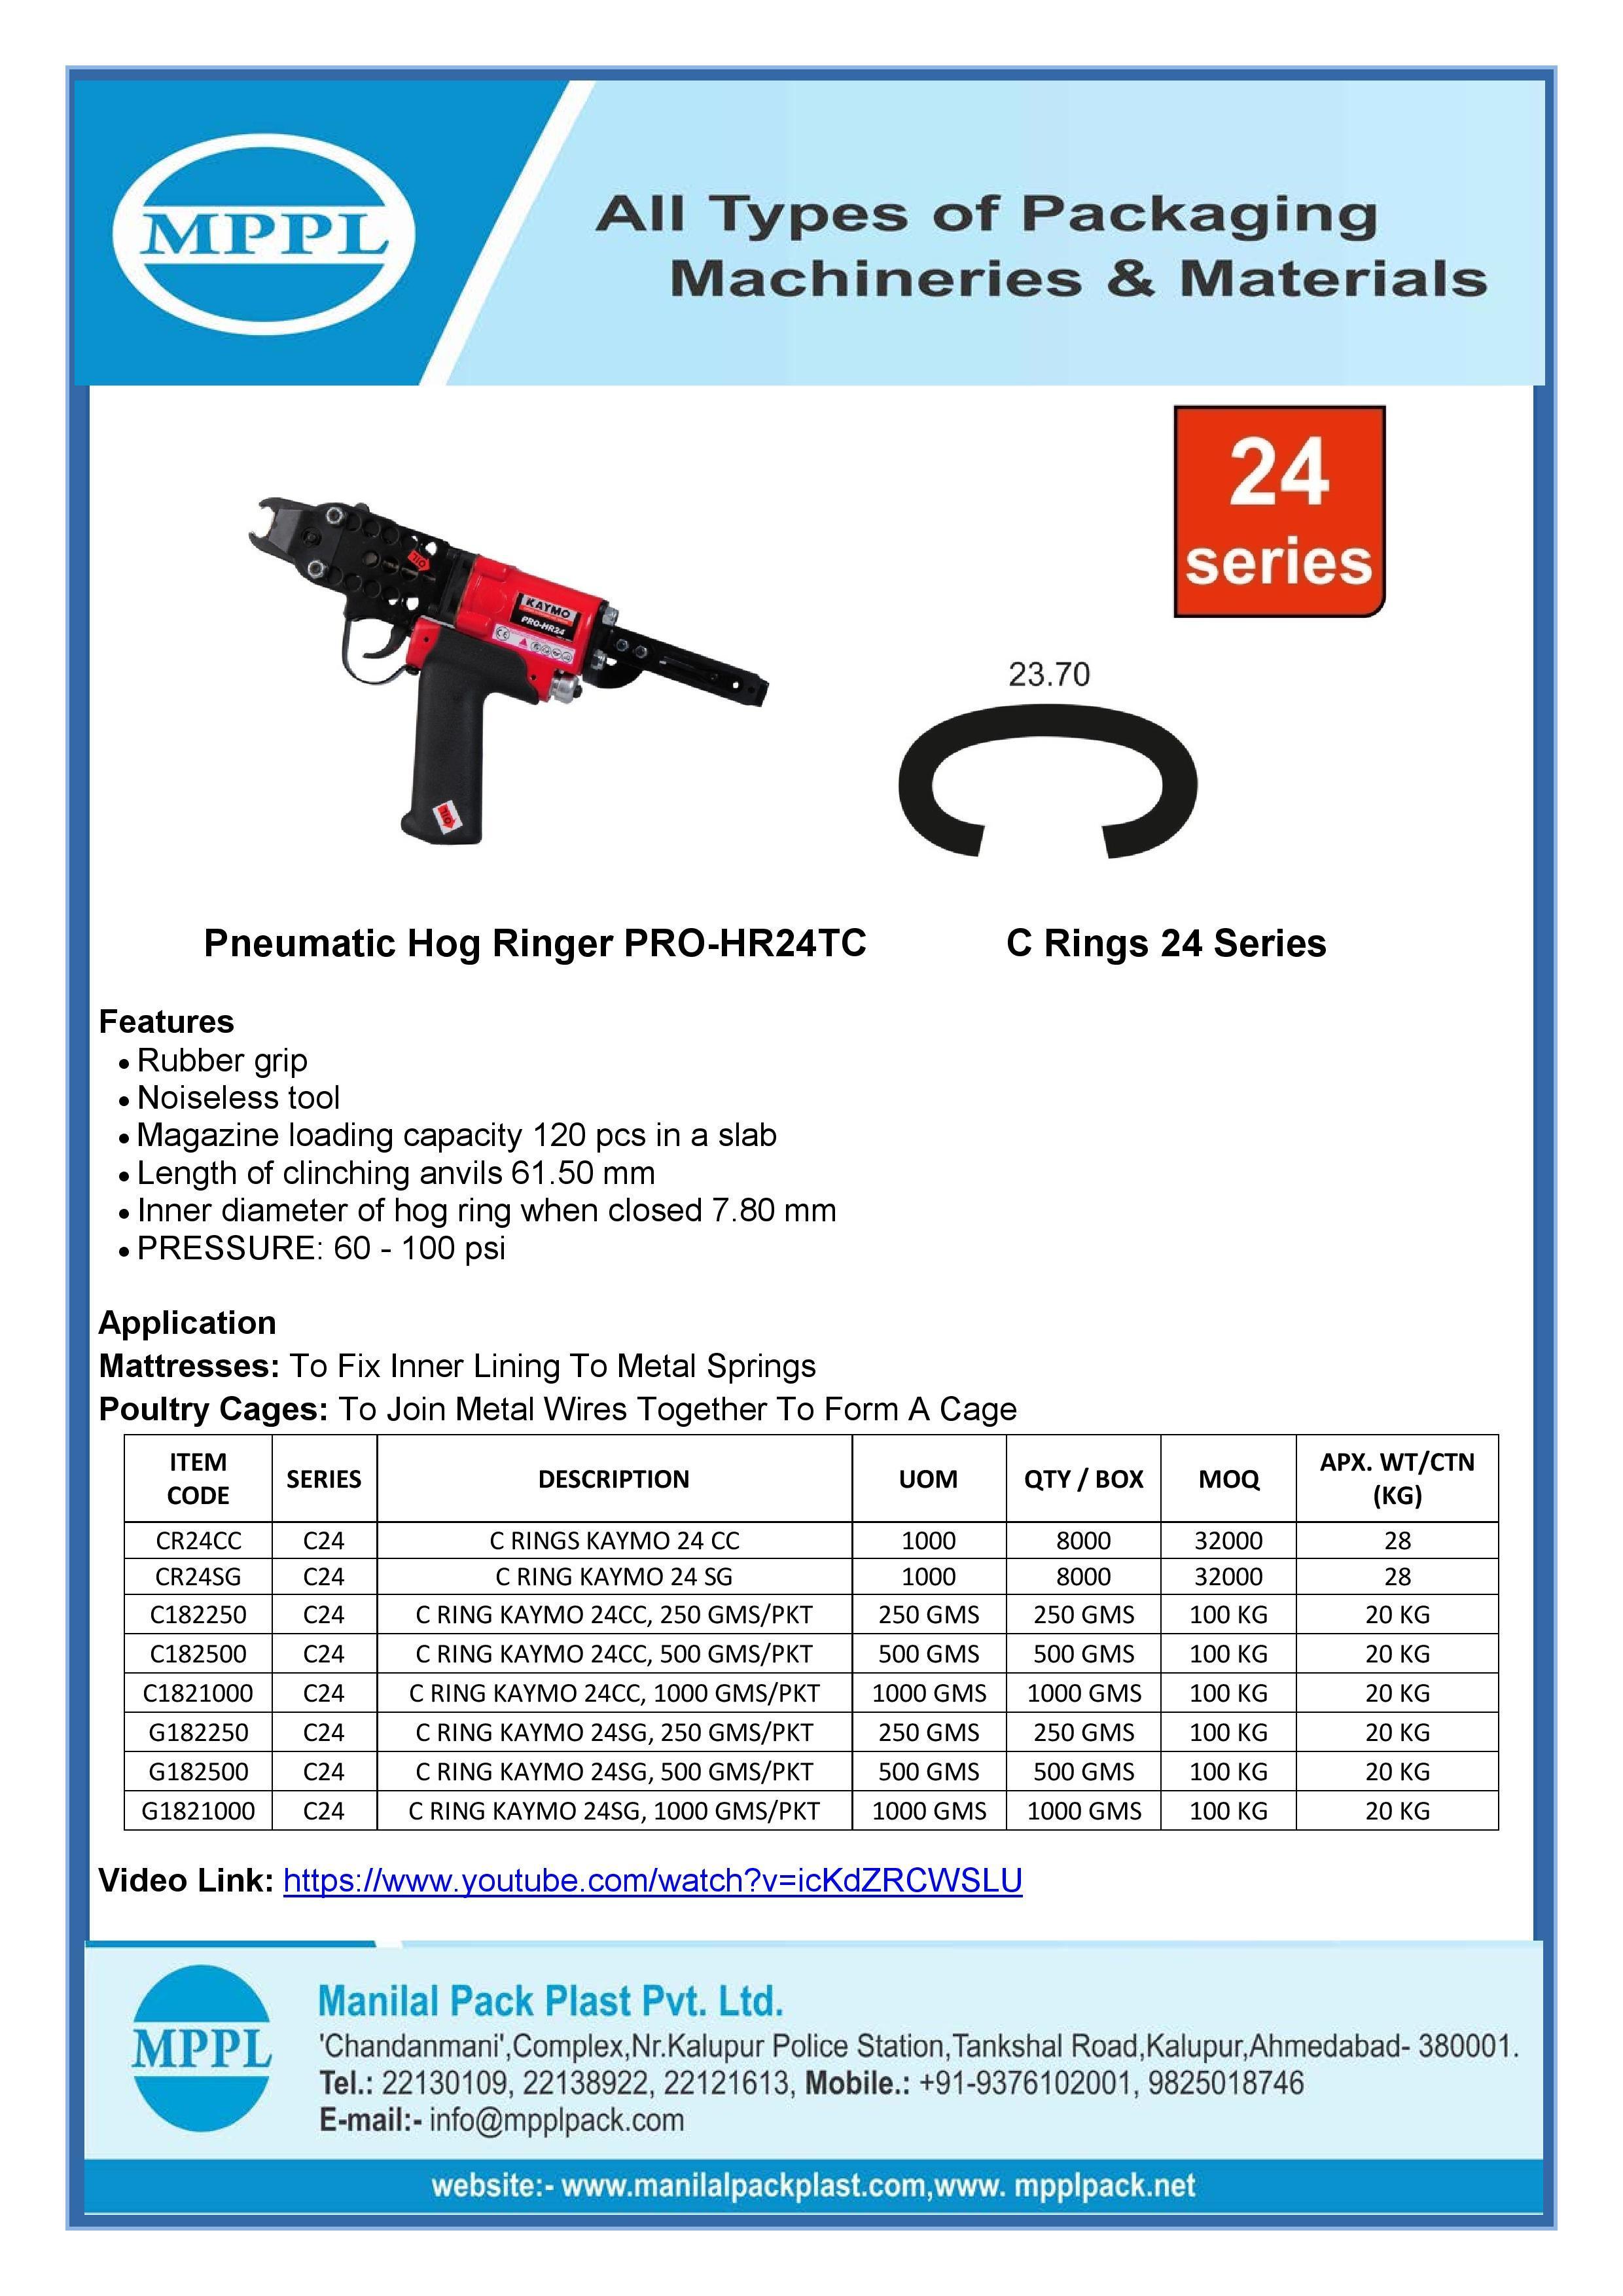 Pneumatic Hog Ringer PRO-HR24TC